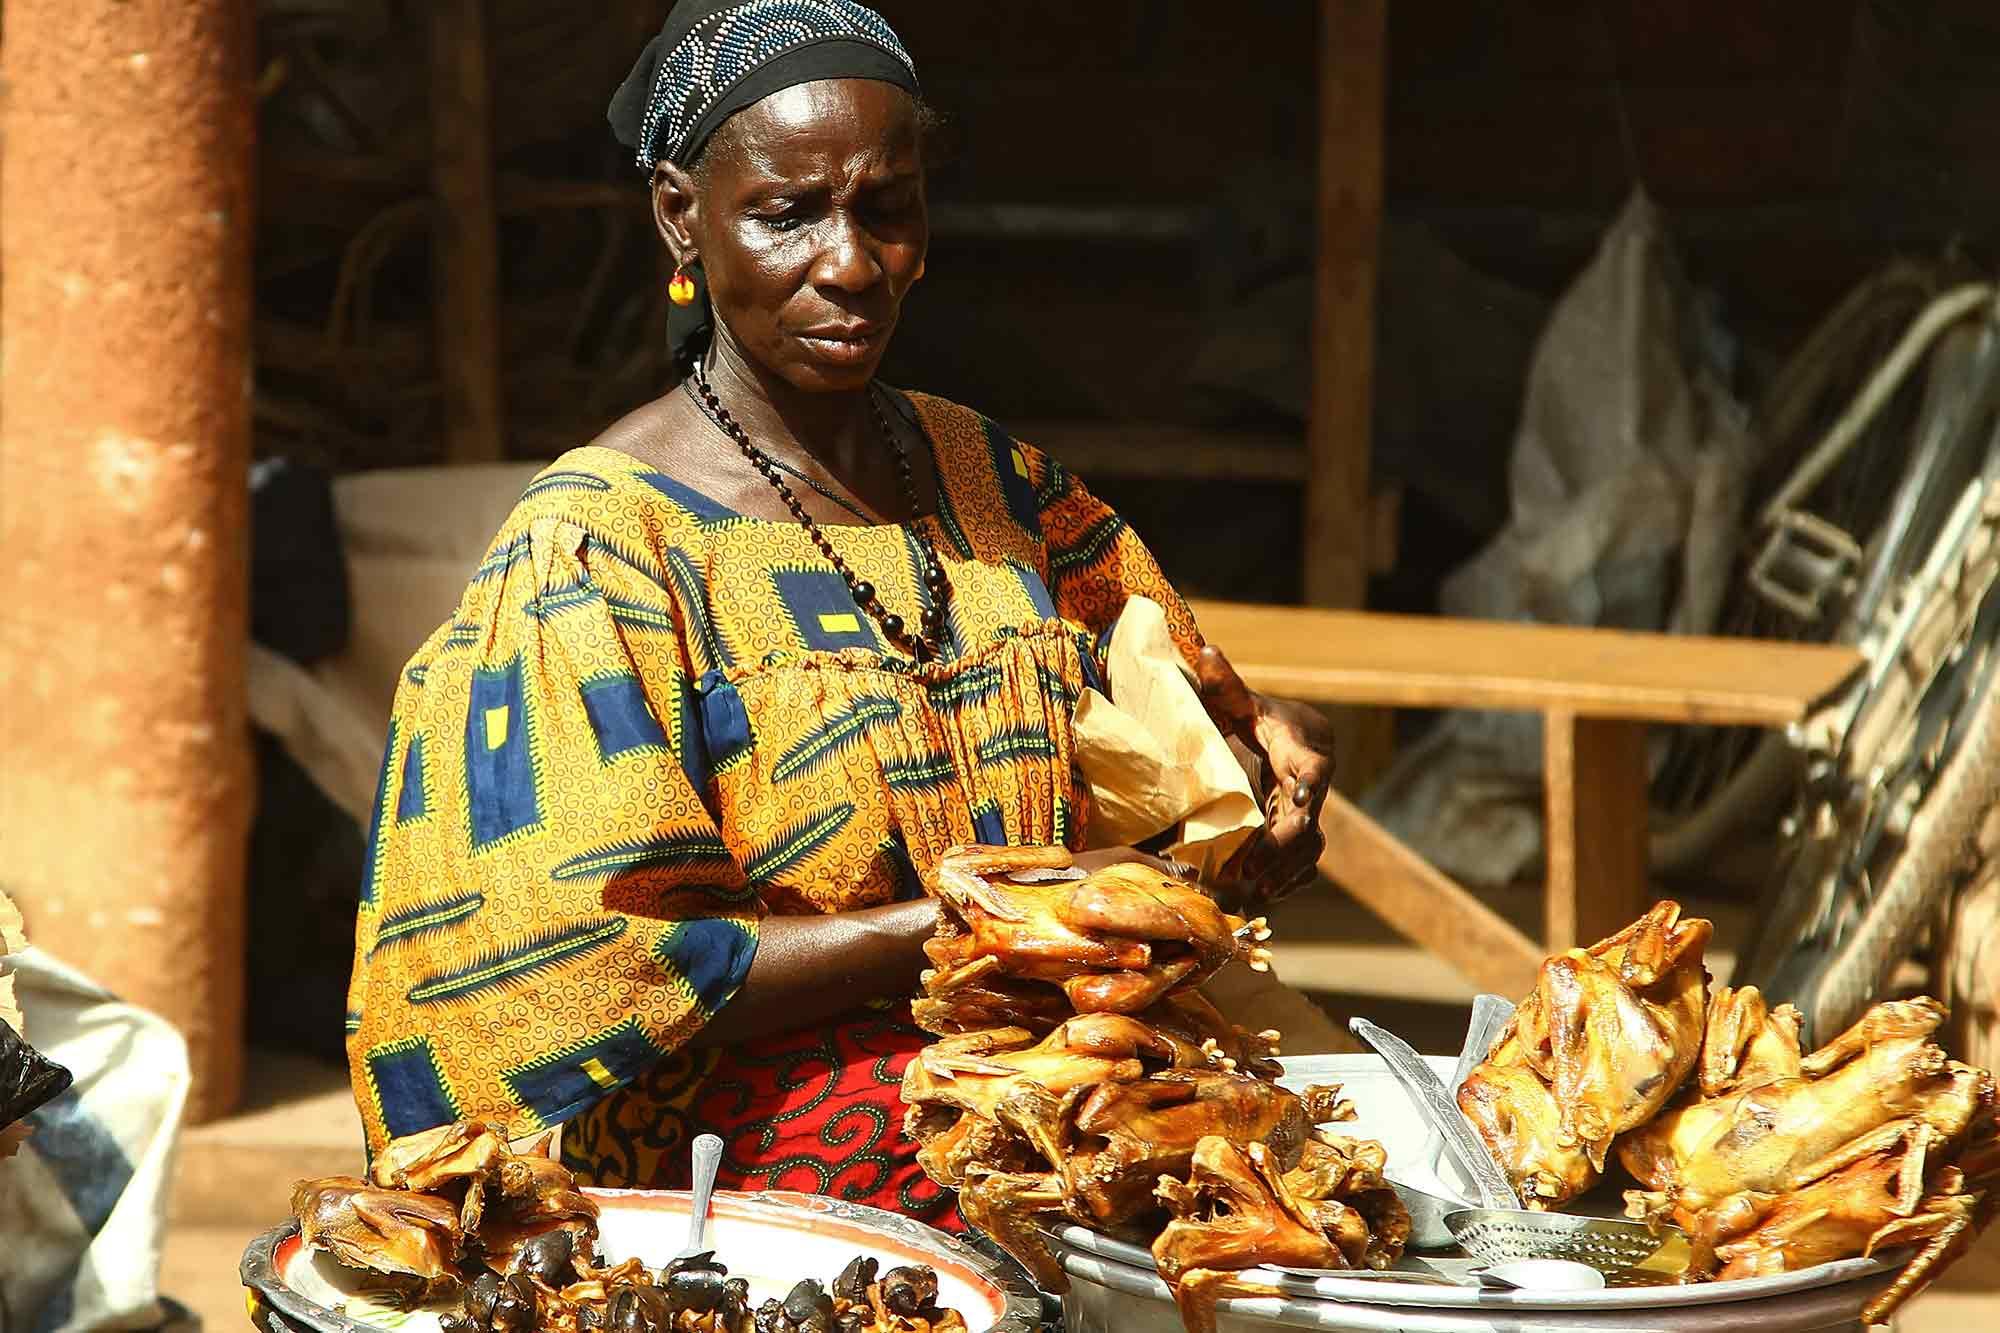 At a market in Ouagadougou, Burkina Faso. © Ulli Maier & Nisa Maier